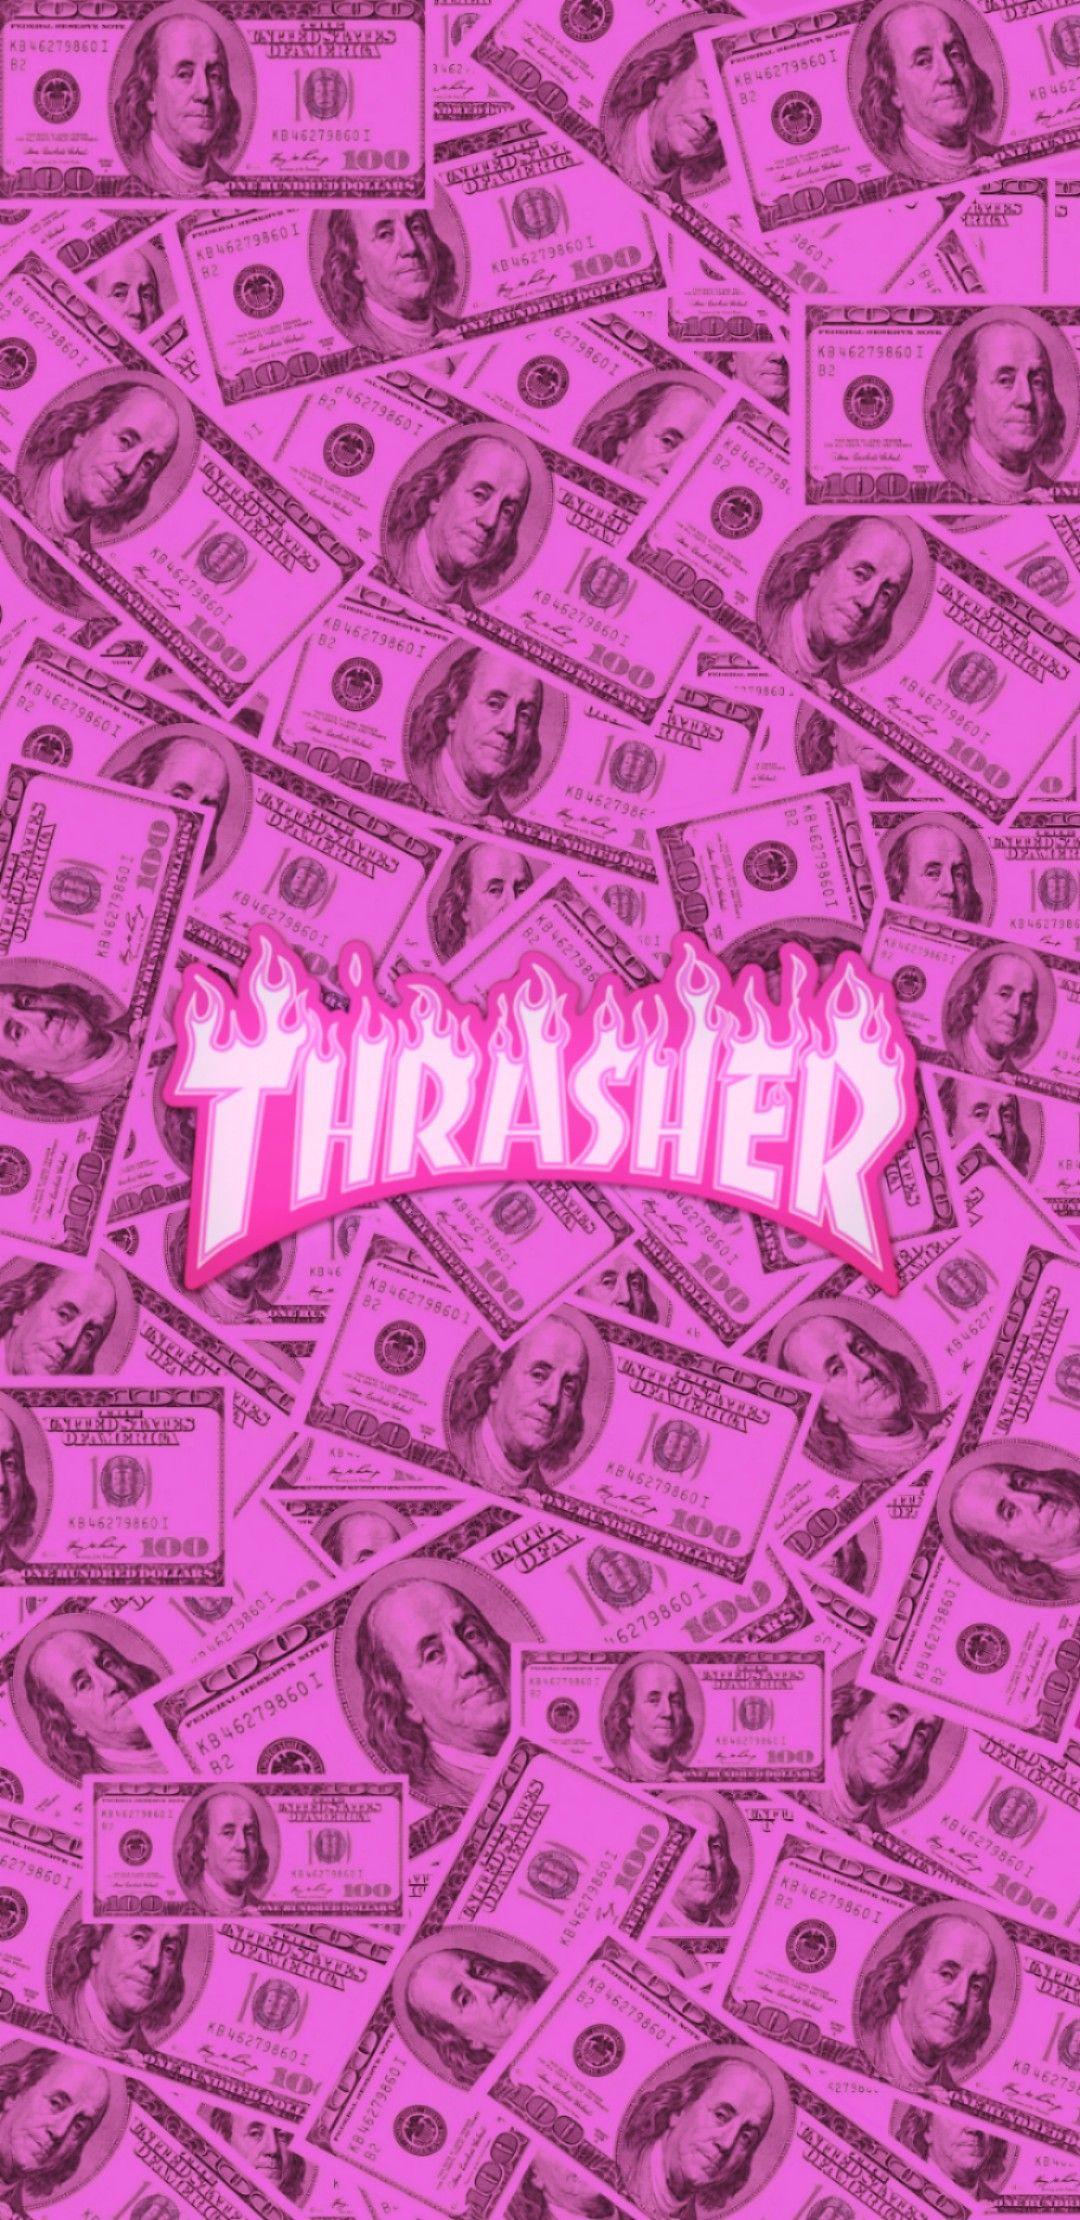 Pink Money Thrasher Background Wallpaper Tumblr Dinheiro Rosa Logo Background Plano De F Em 2020 Planos De Fundo Rosas Papel De Parede Planos De Fundo Tumblr